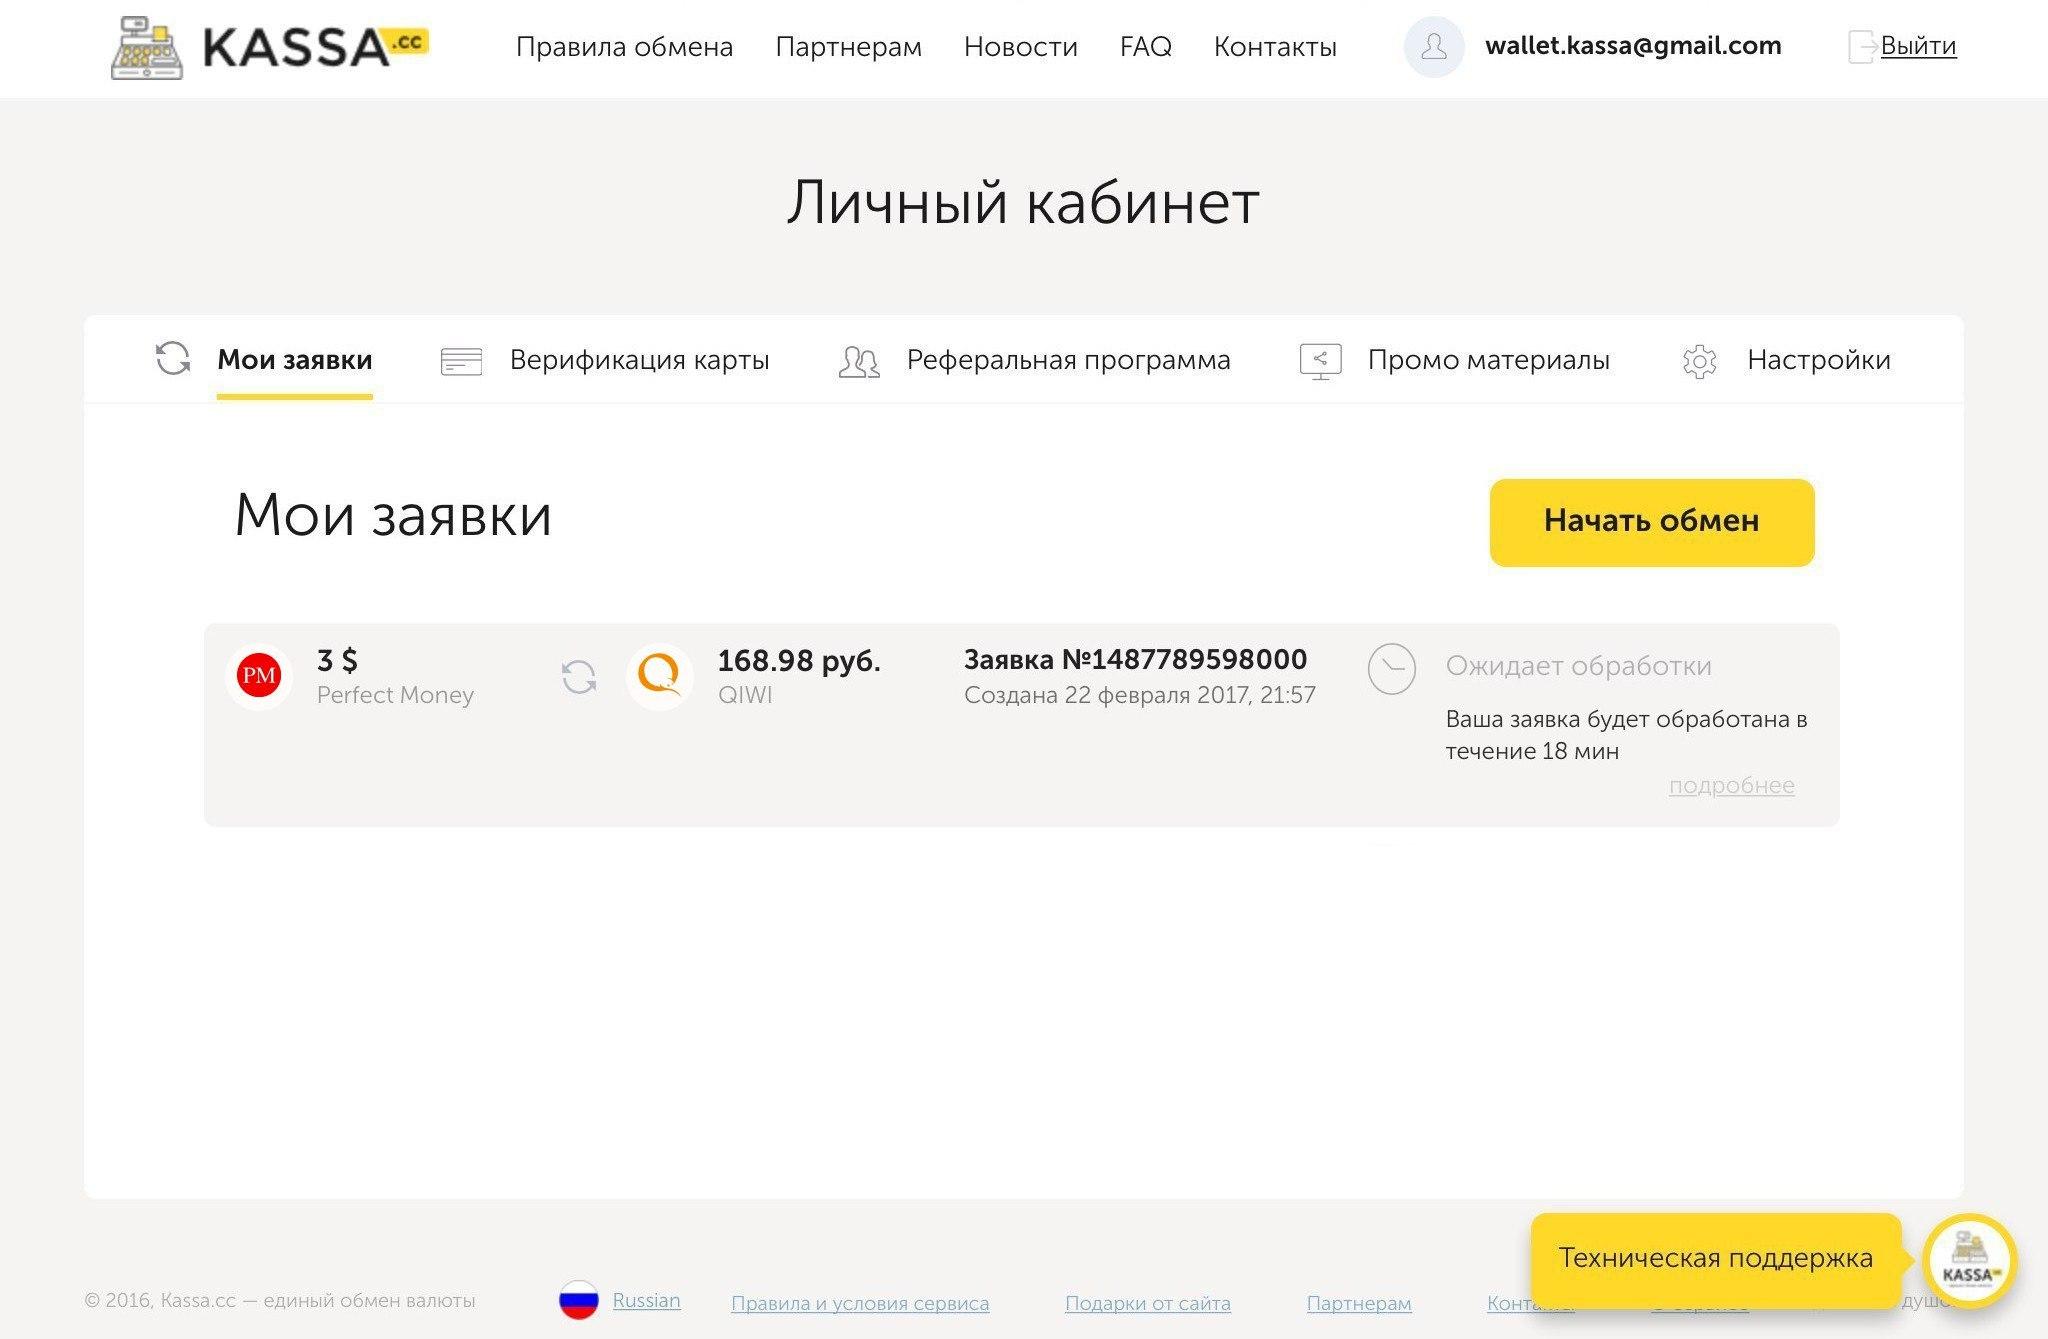 Kassa.cc - единый обмен валюты. Обмен Perfect Money USD на QIWI RUB